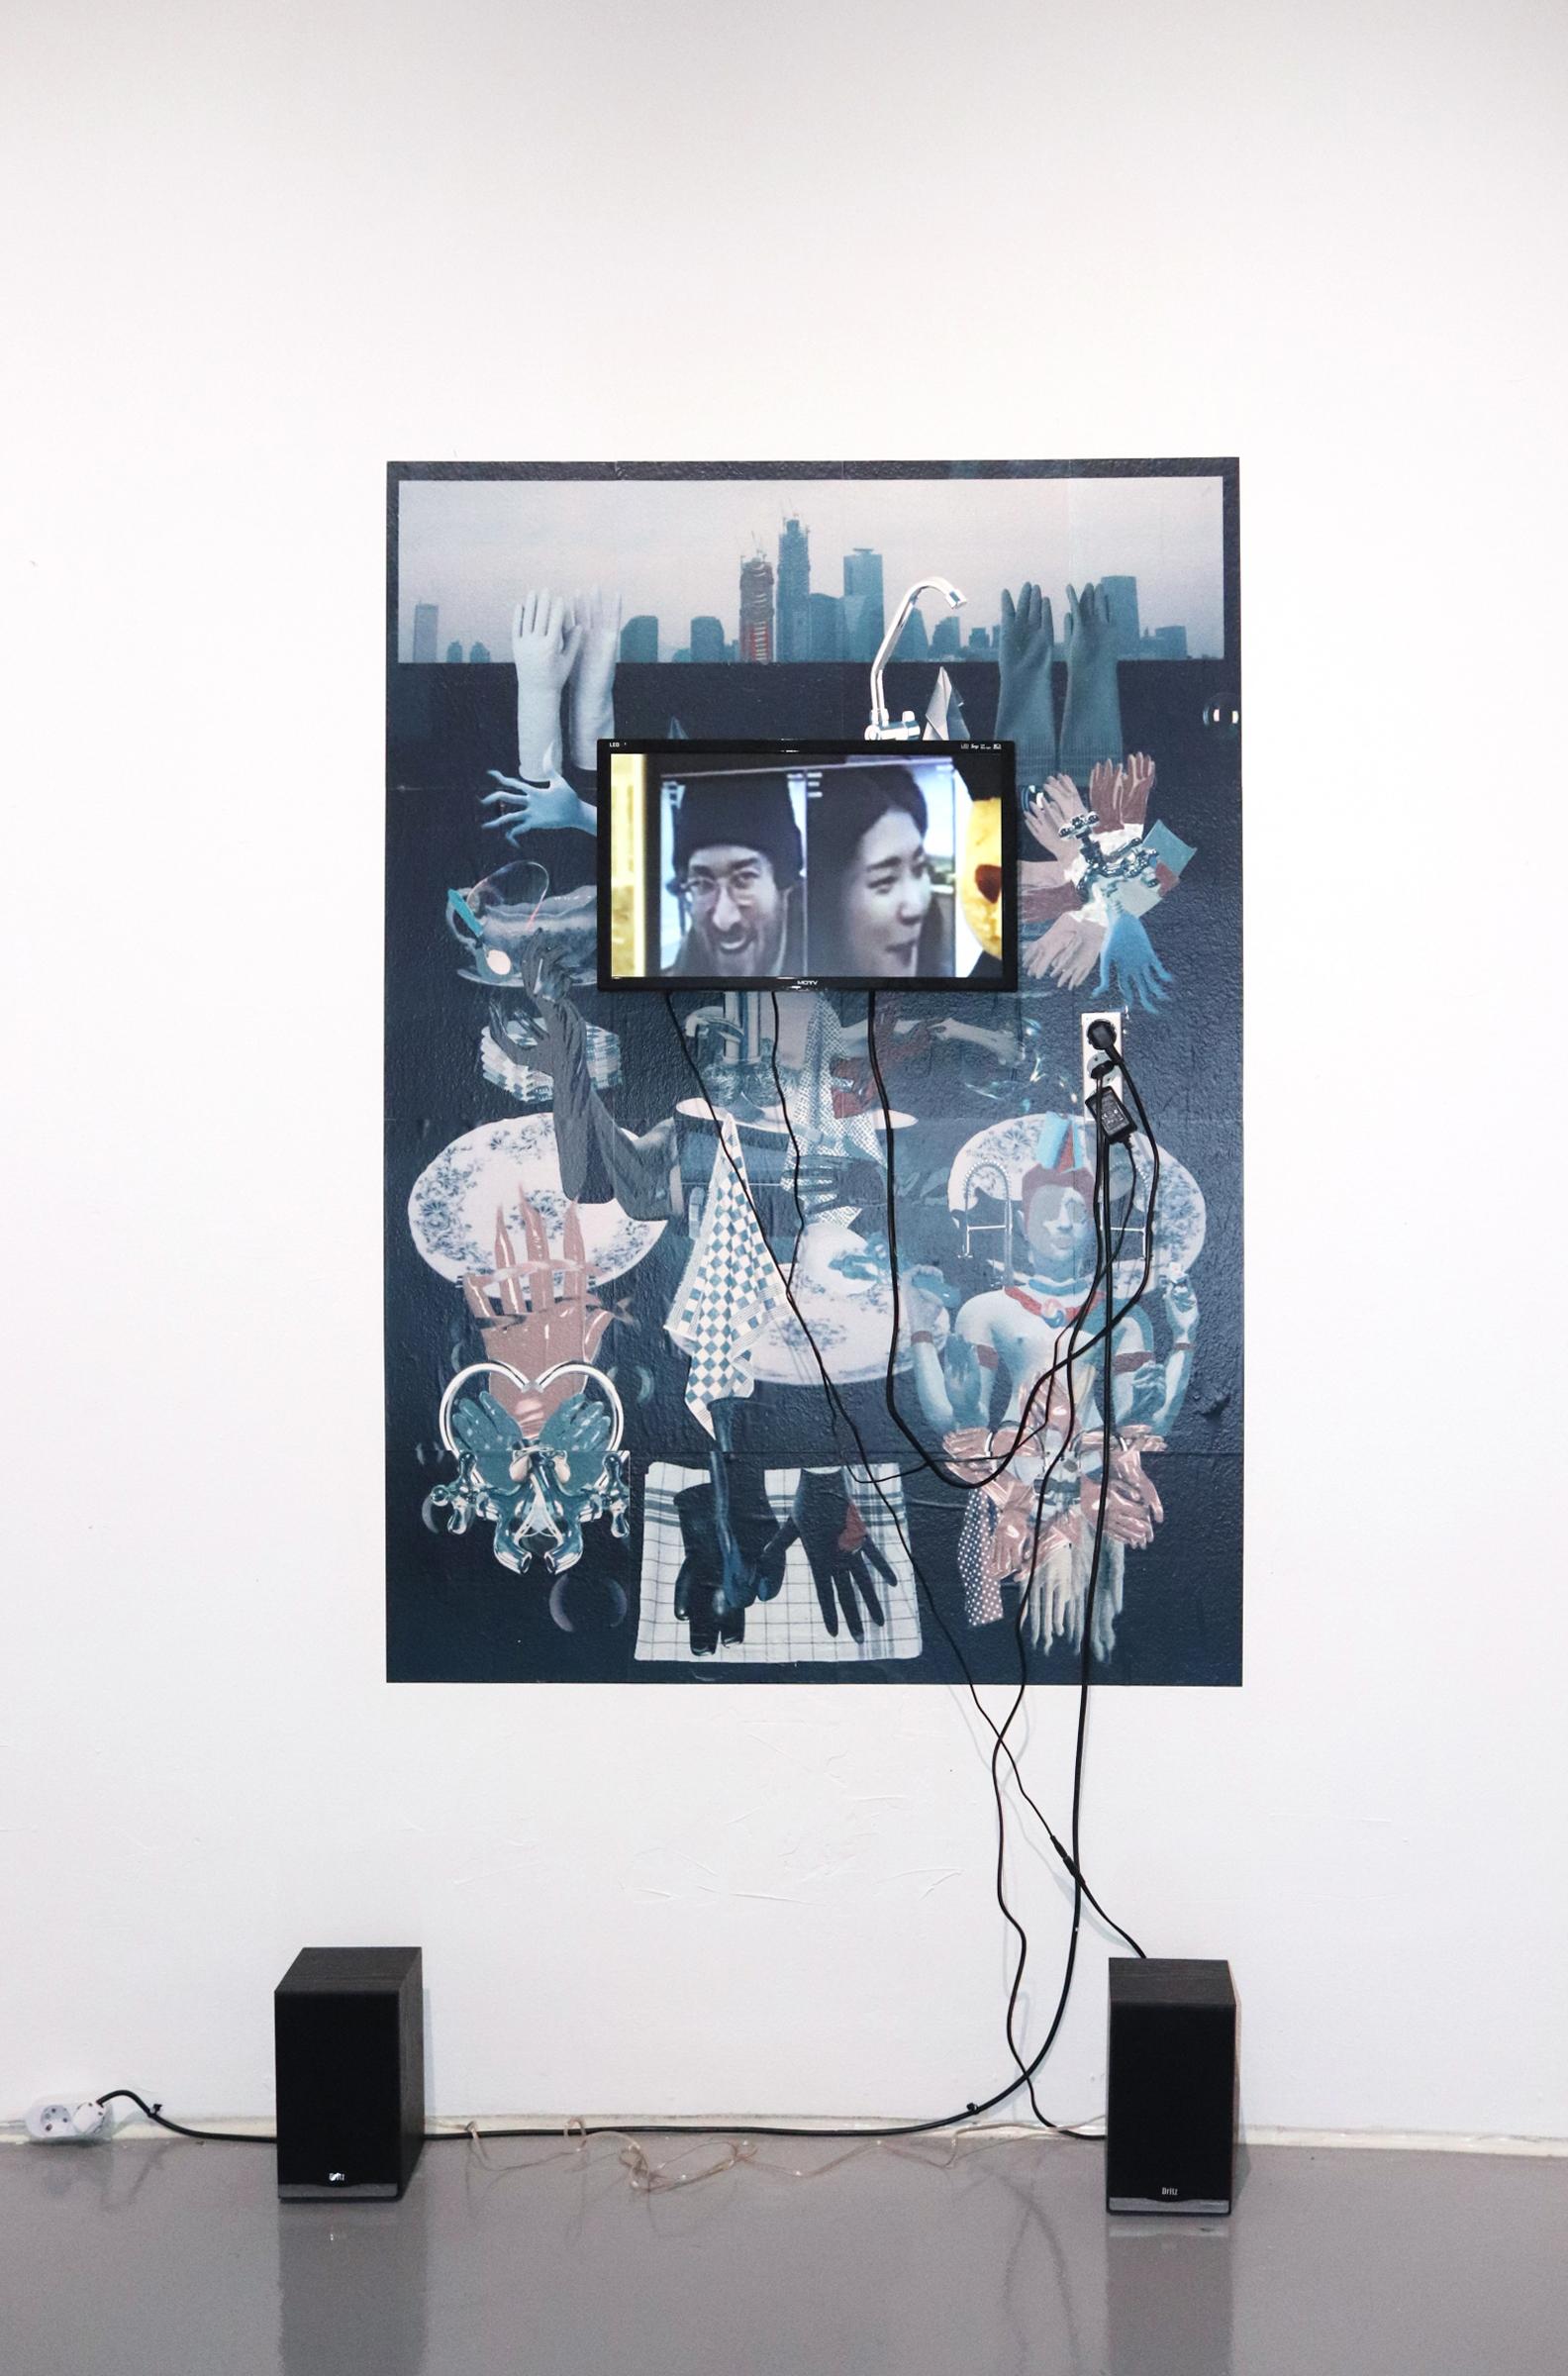 Untitled installation, Happyland William Ludwig Lutgens와의 협동작업, 2019 Video by William Ludwig Lutgens /Print by Che Go Eun 200cm x 100cm